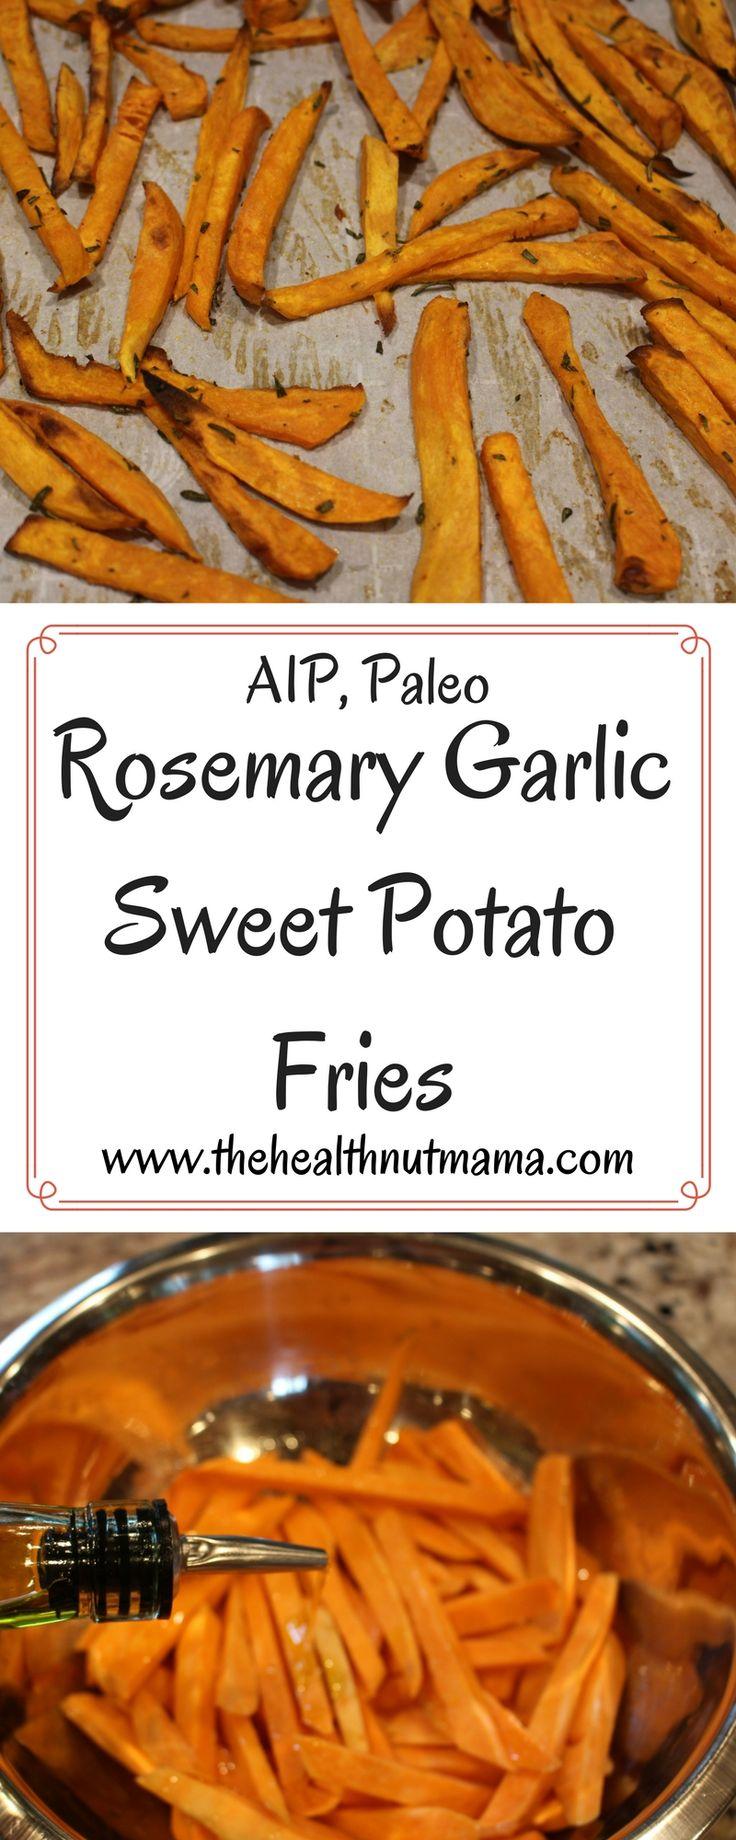 Quick & Delicious Rosemary Garlic Sweet Potato Fries! (AIP, Paleo) www.thehealthnutmama.com